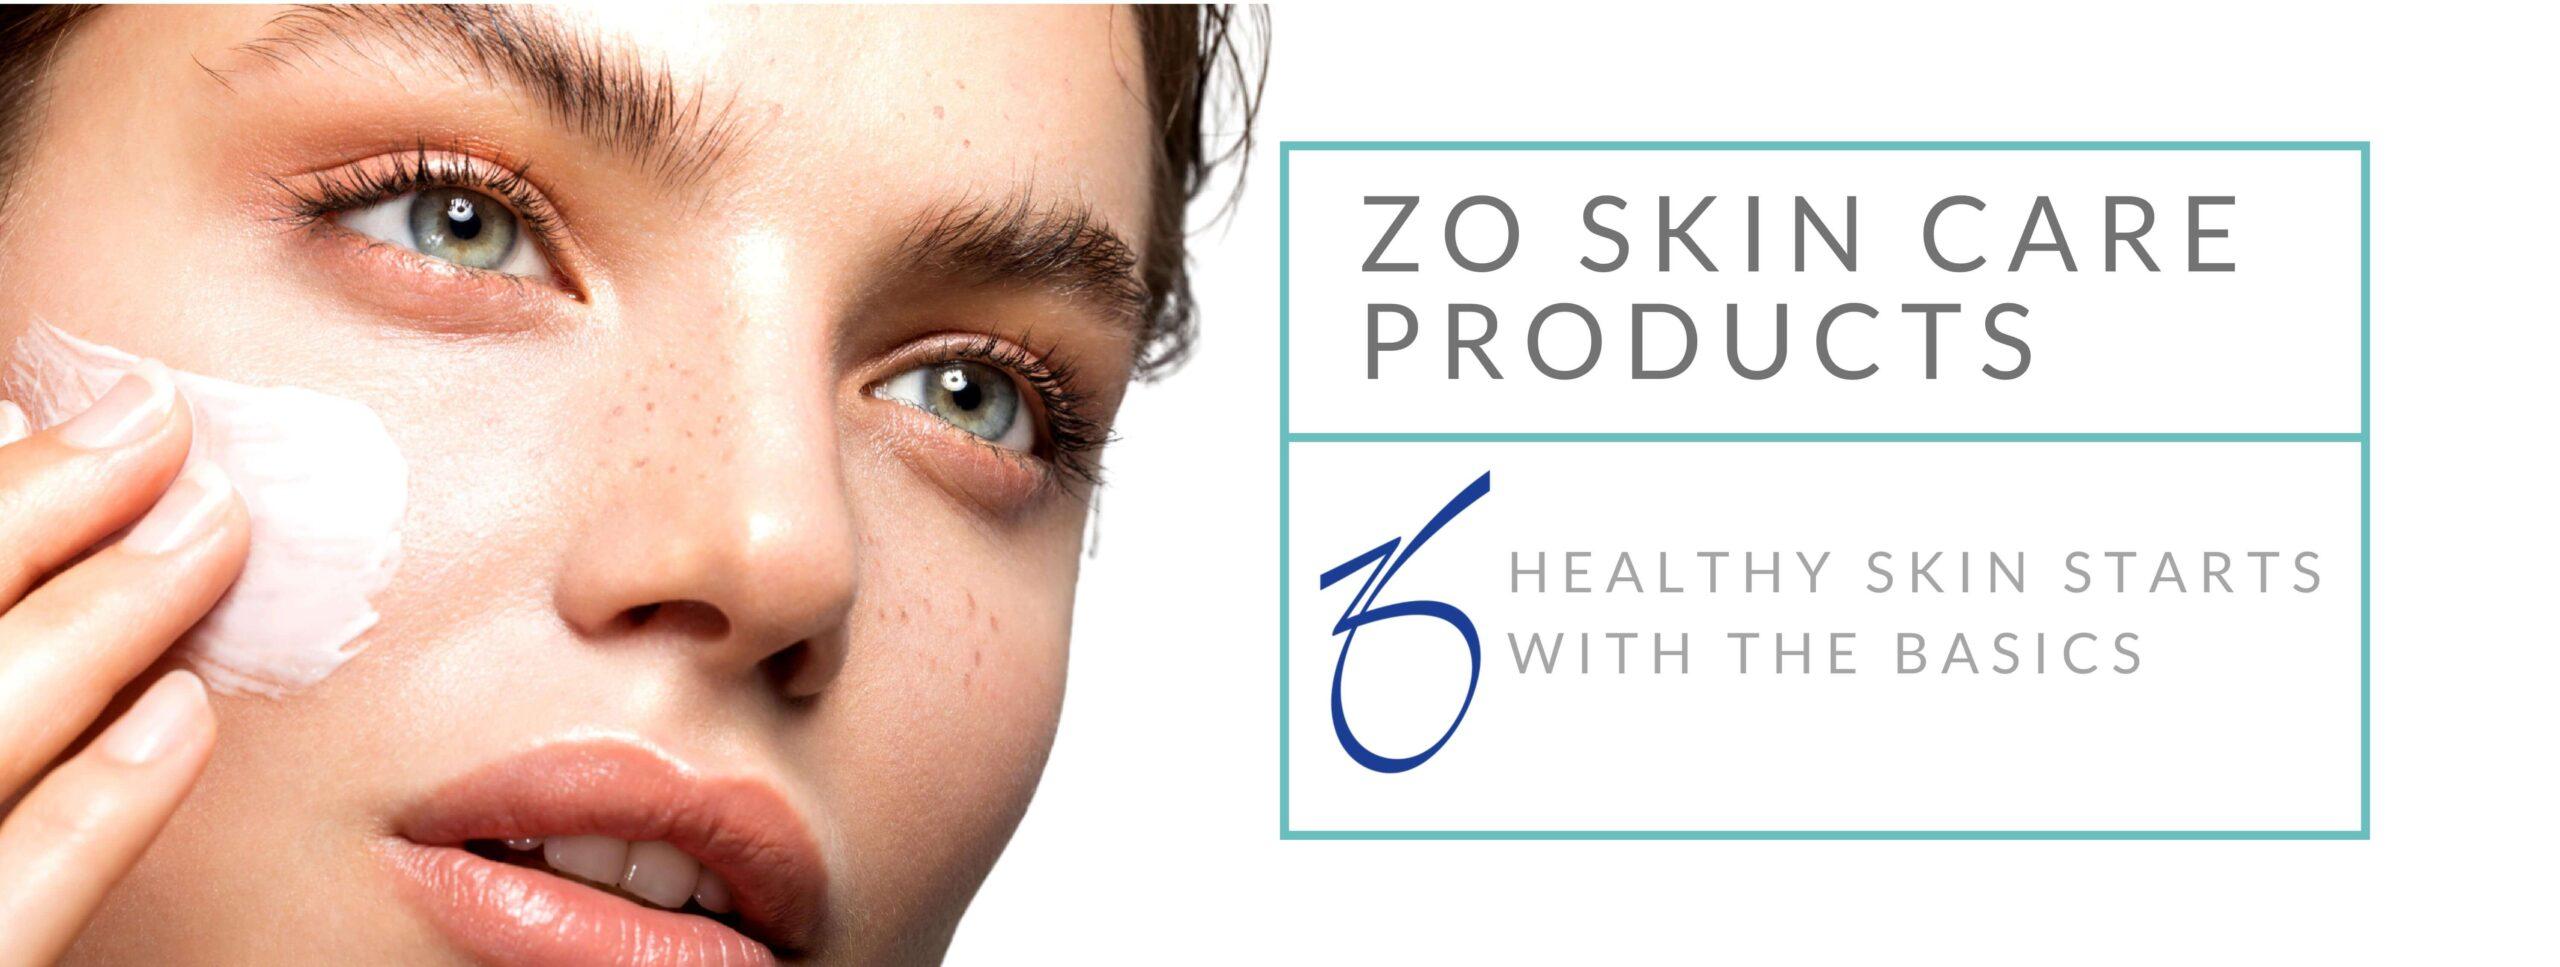 zo_skincare_products_bernardsville,nj_jwalkerwellness